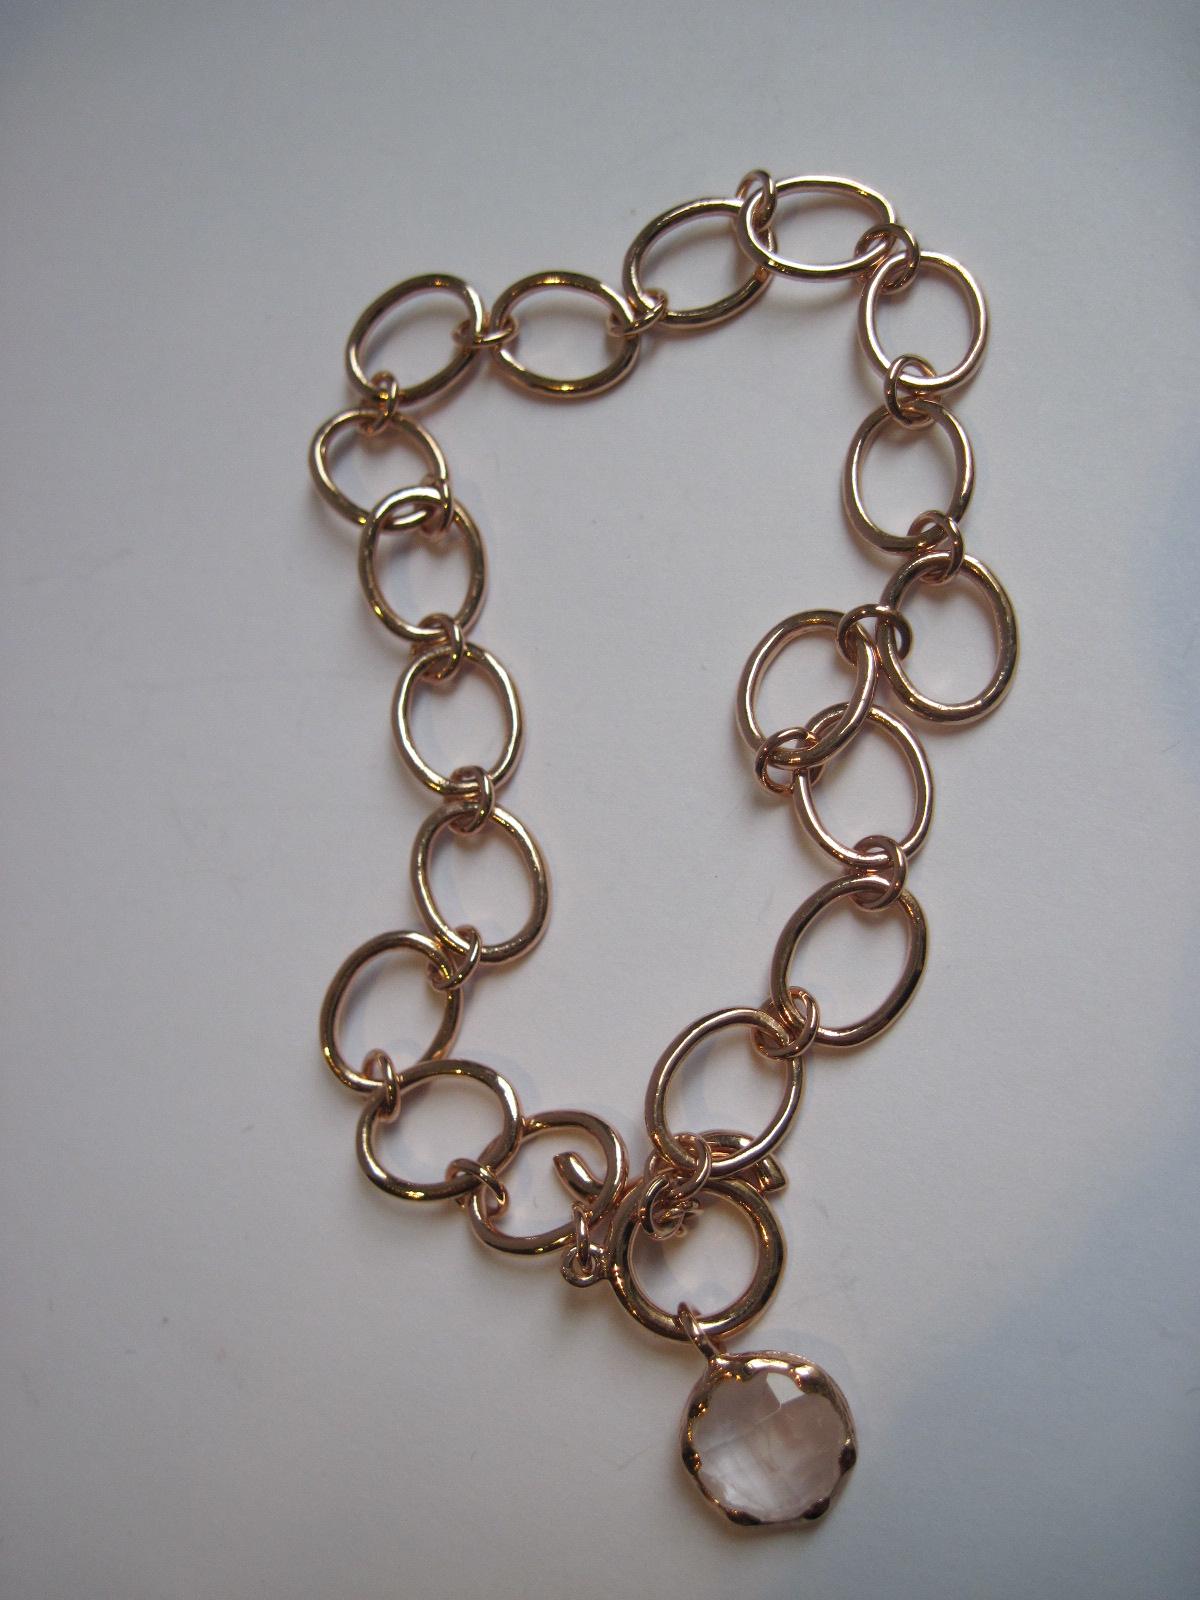 rosévergoldetes Armband mit Rosenquarz